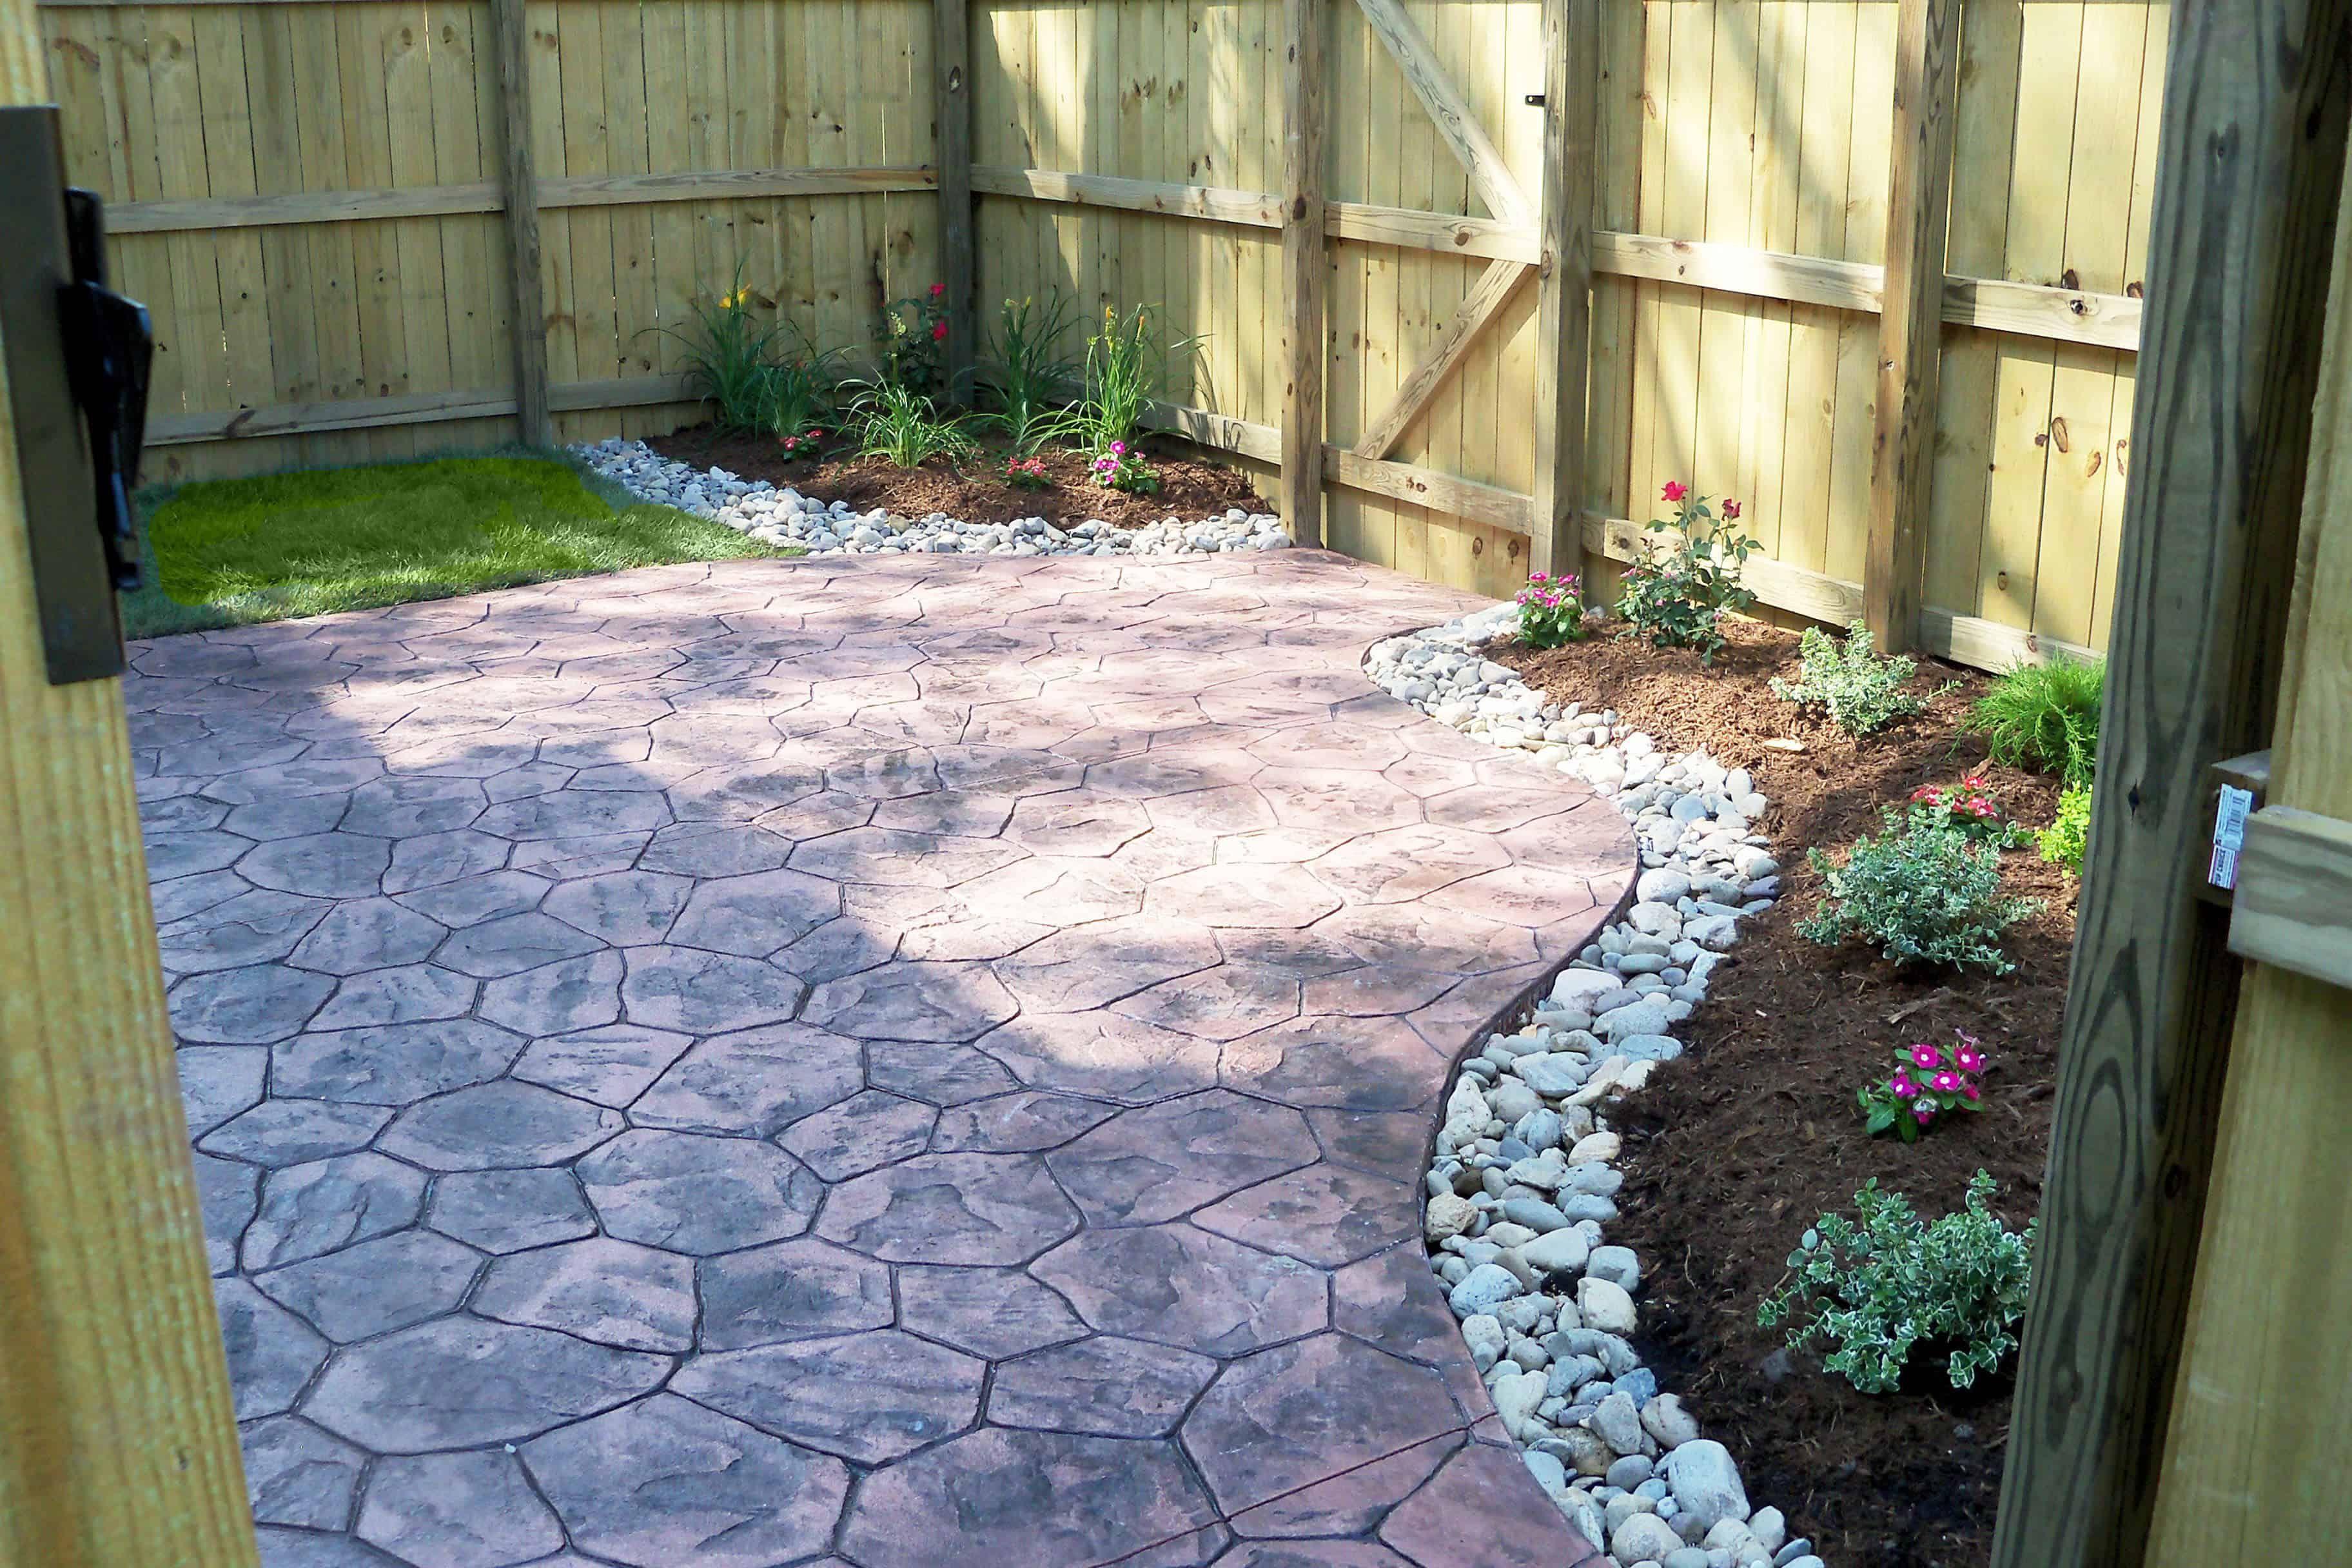 11 Creative Ideas How To Improve Concrete Backyards Simphome Small Backyard Landscaping Concrete Backyard Backyard Landscaping Townhouse backyard design ideas